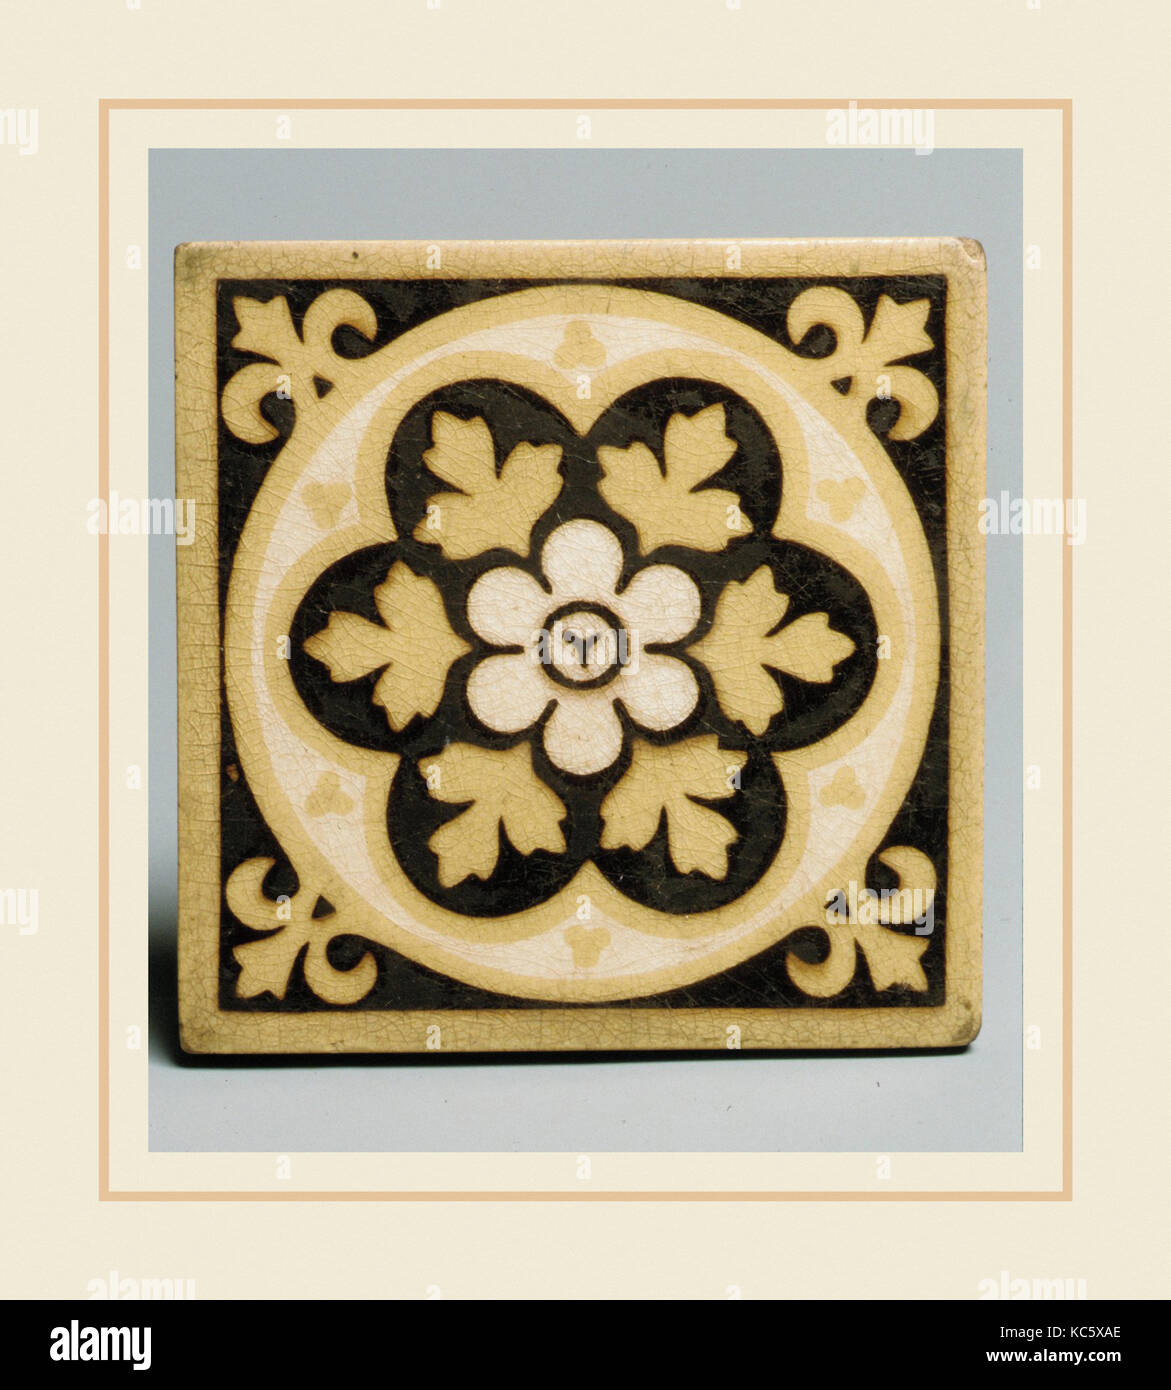 Encaustic Tile Stockfotos & Encaustic Tile Bilder - Alamy